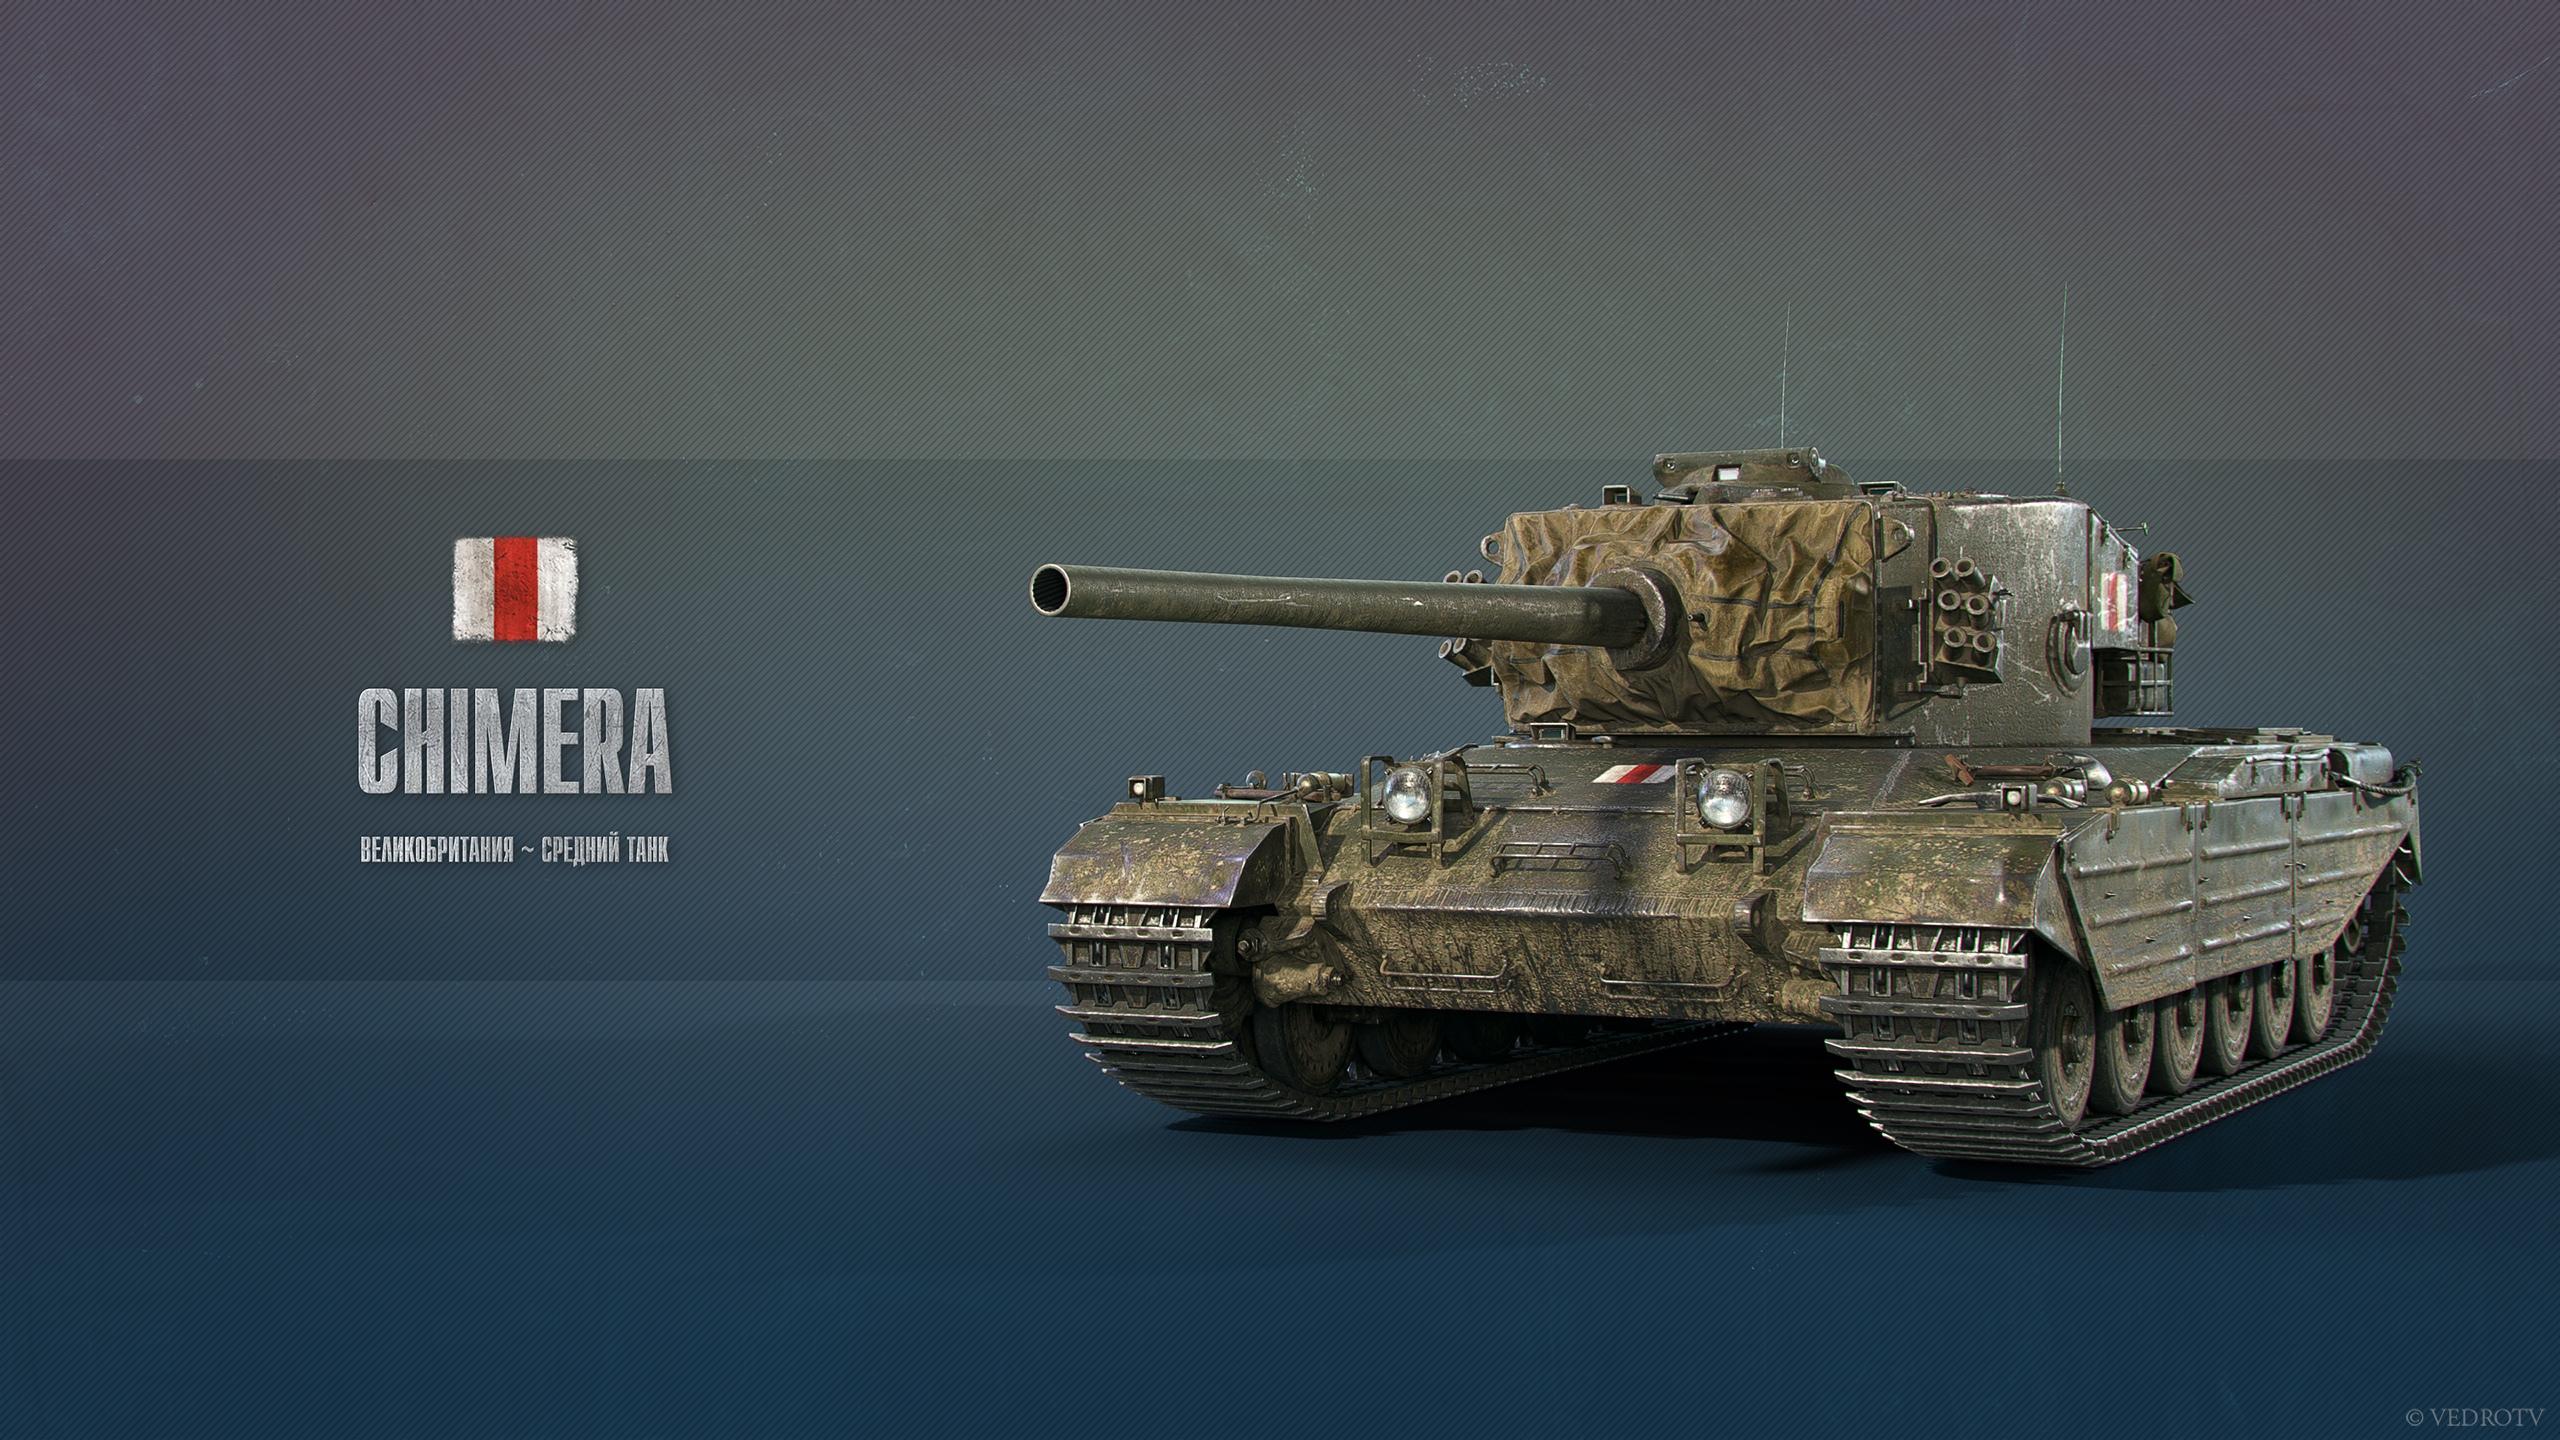 Chimera - средний премиум танк 8 уровня, Британия